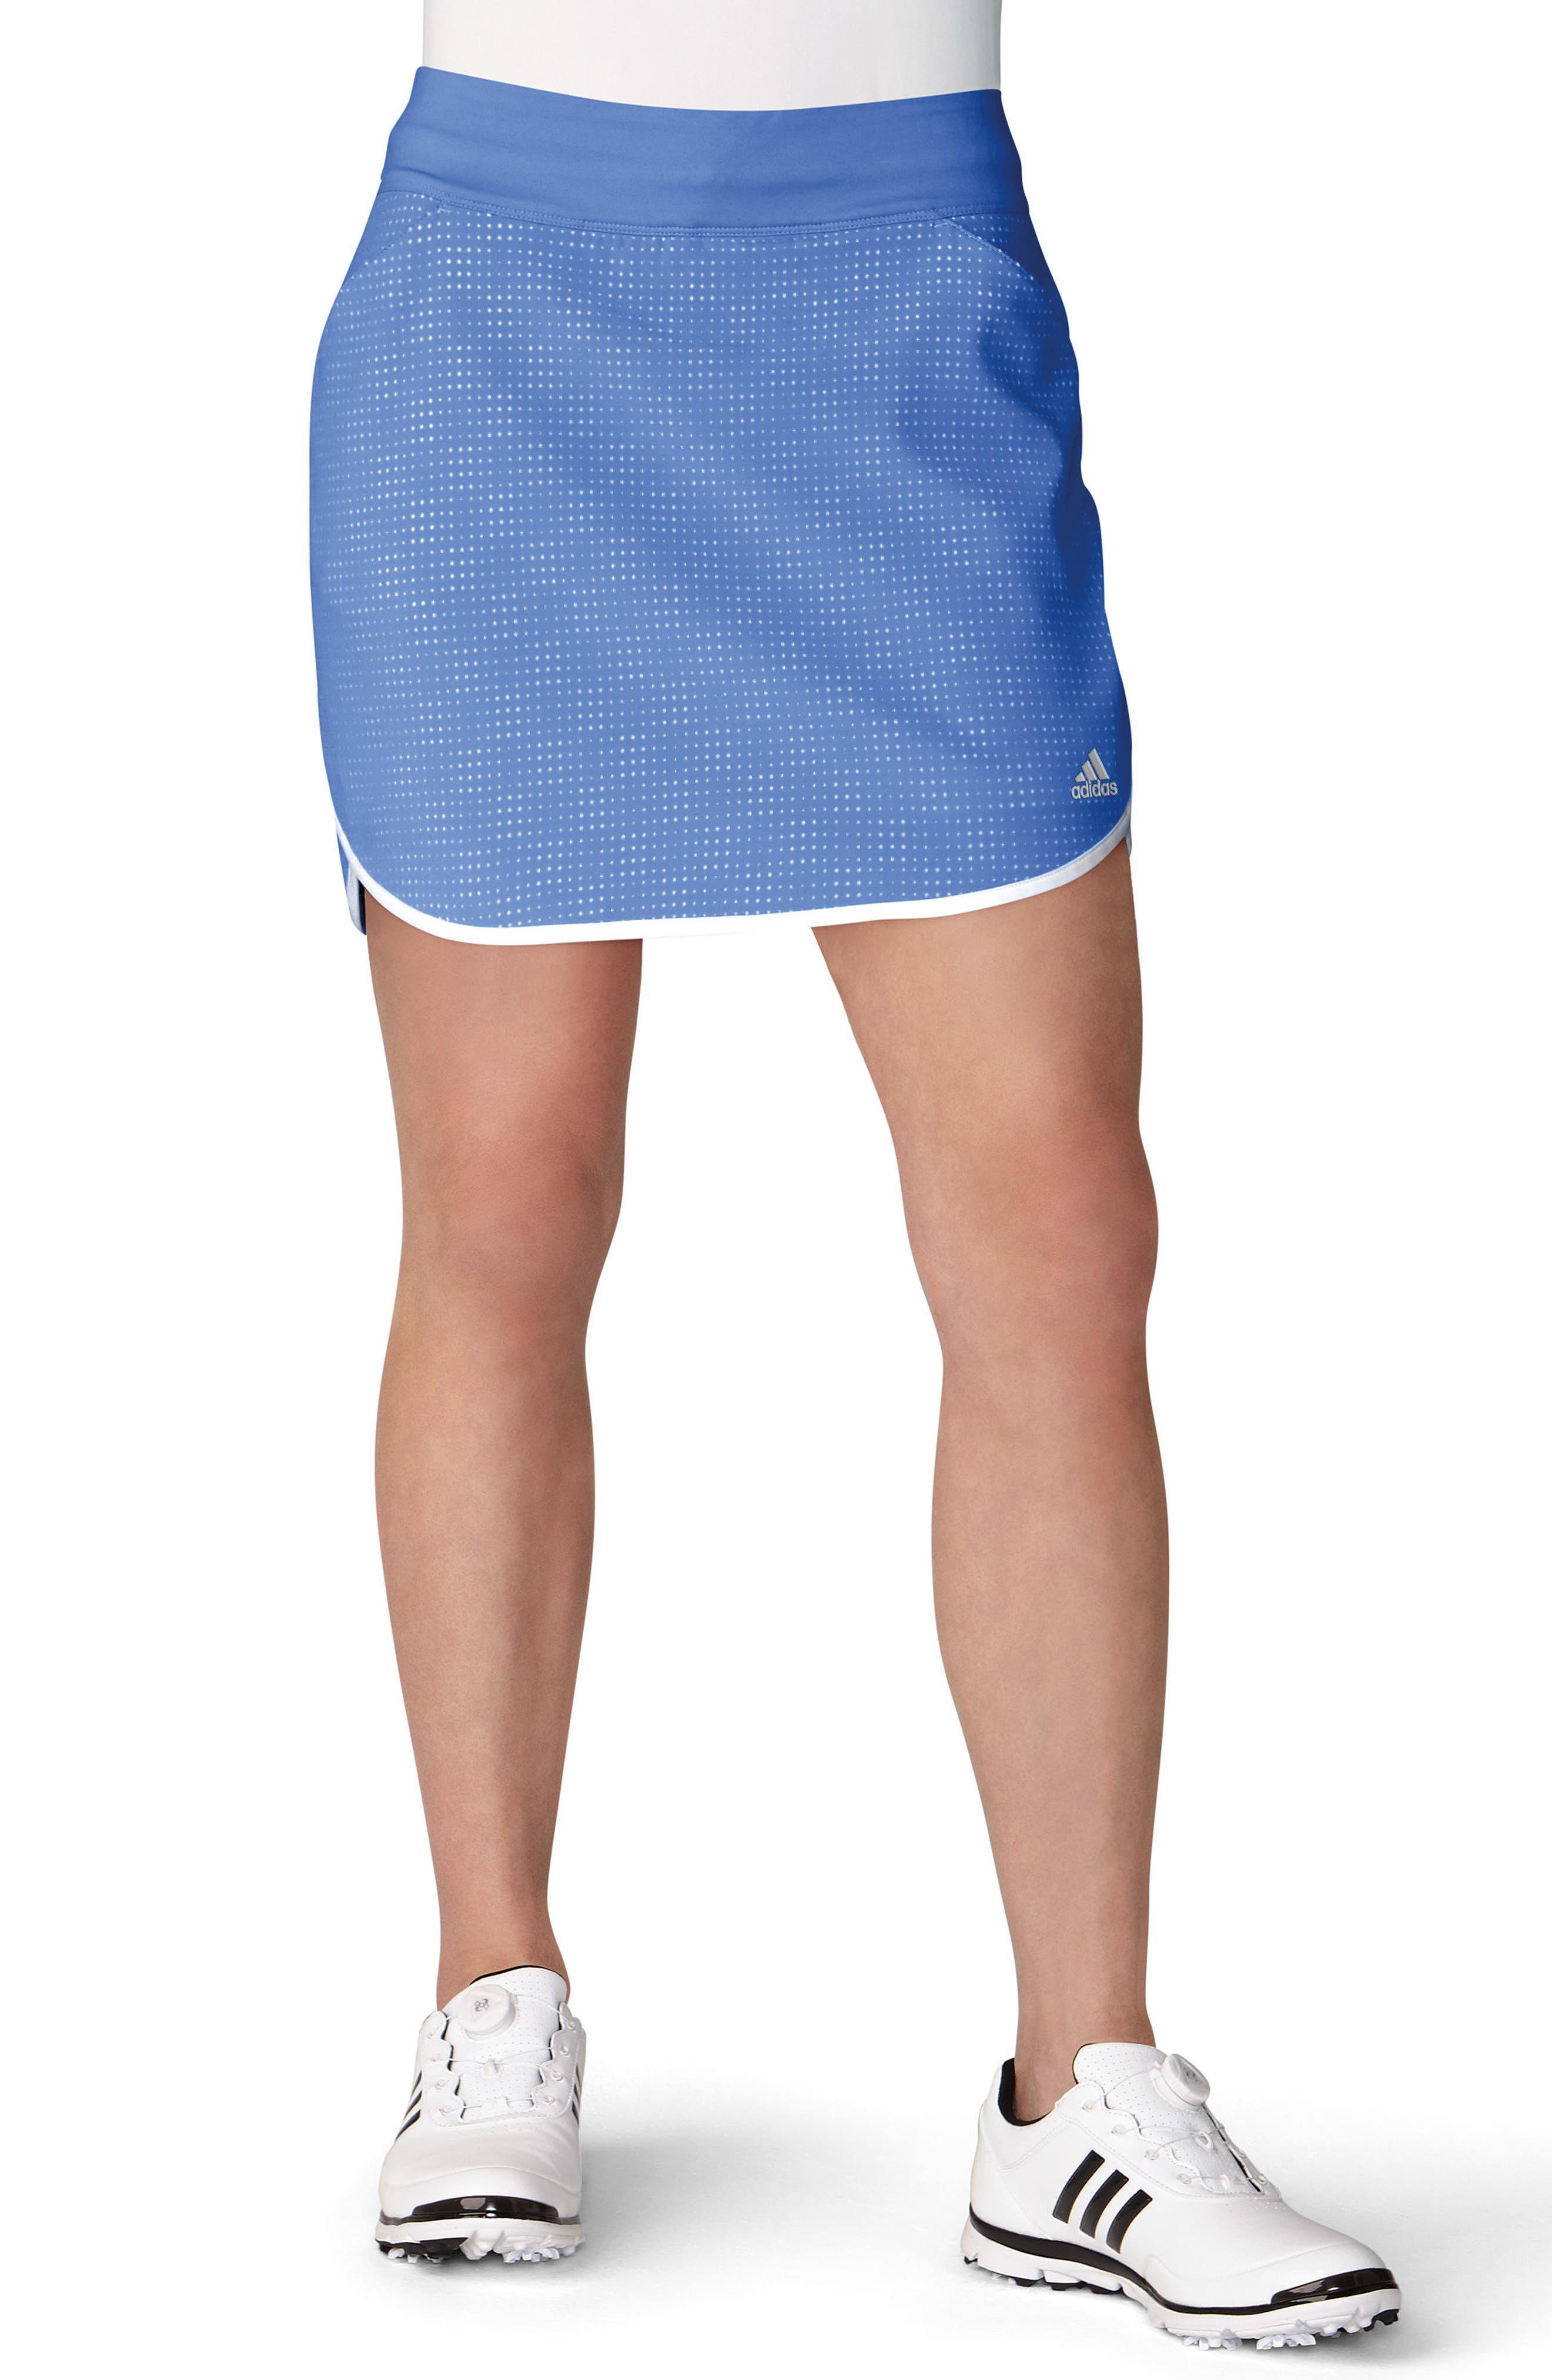 Rangewear Skort,                         Main,                         color, Hi-Res Blue